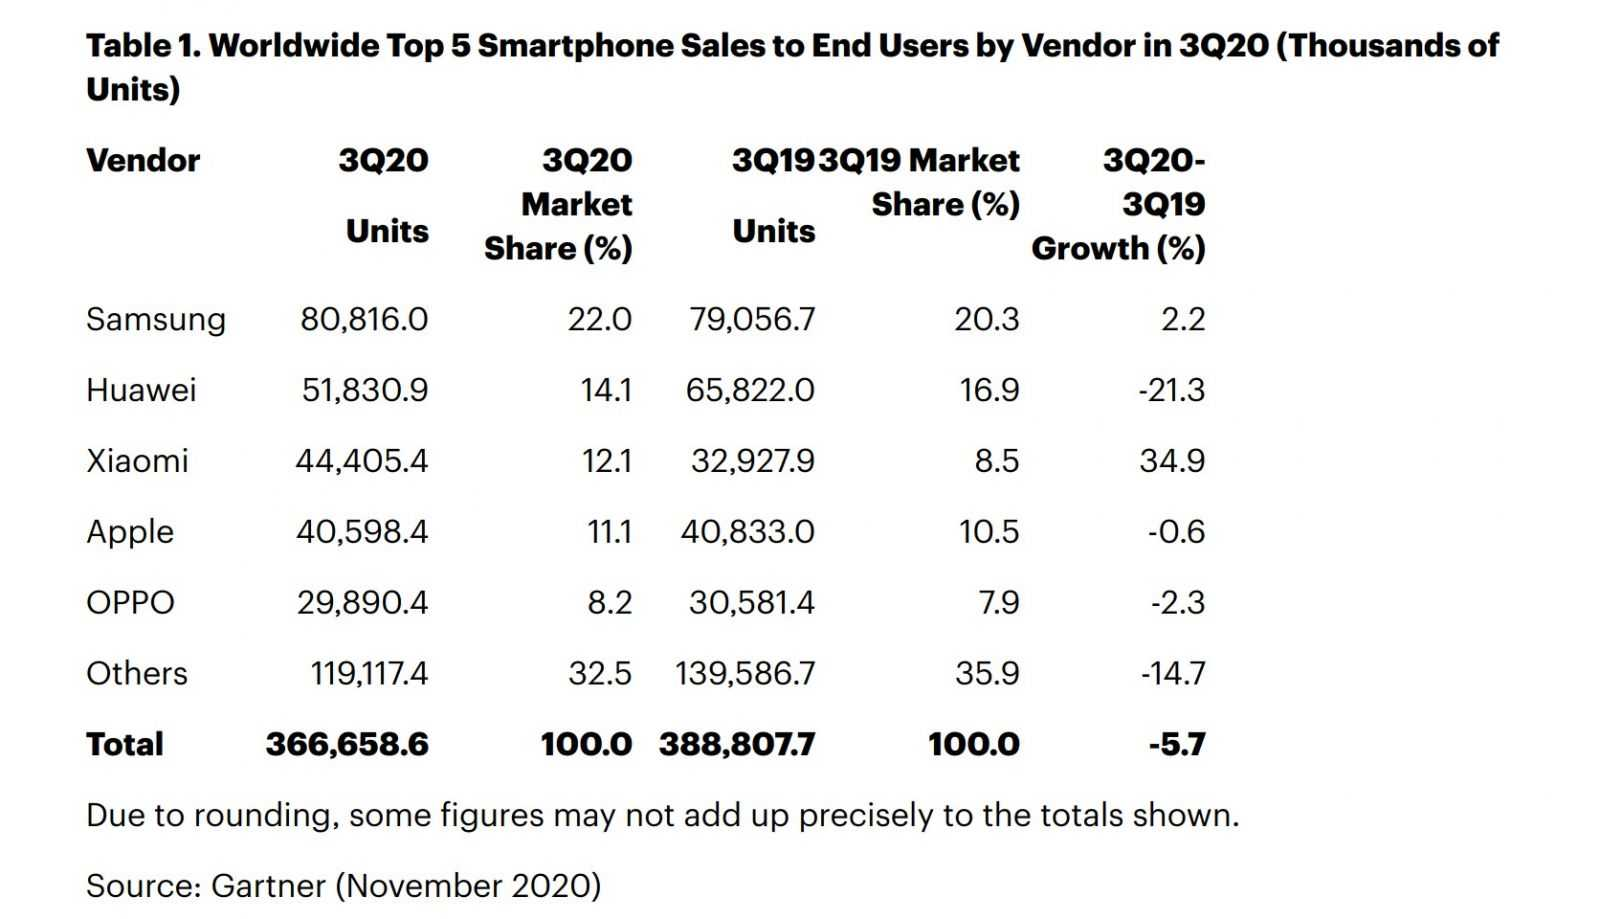 Xiaomi обгнала Apple и стала третьим по величине производителем смартфонов